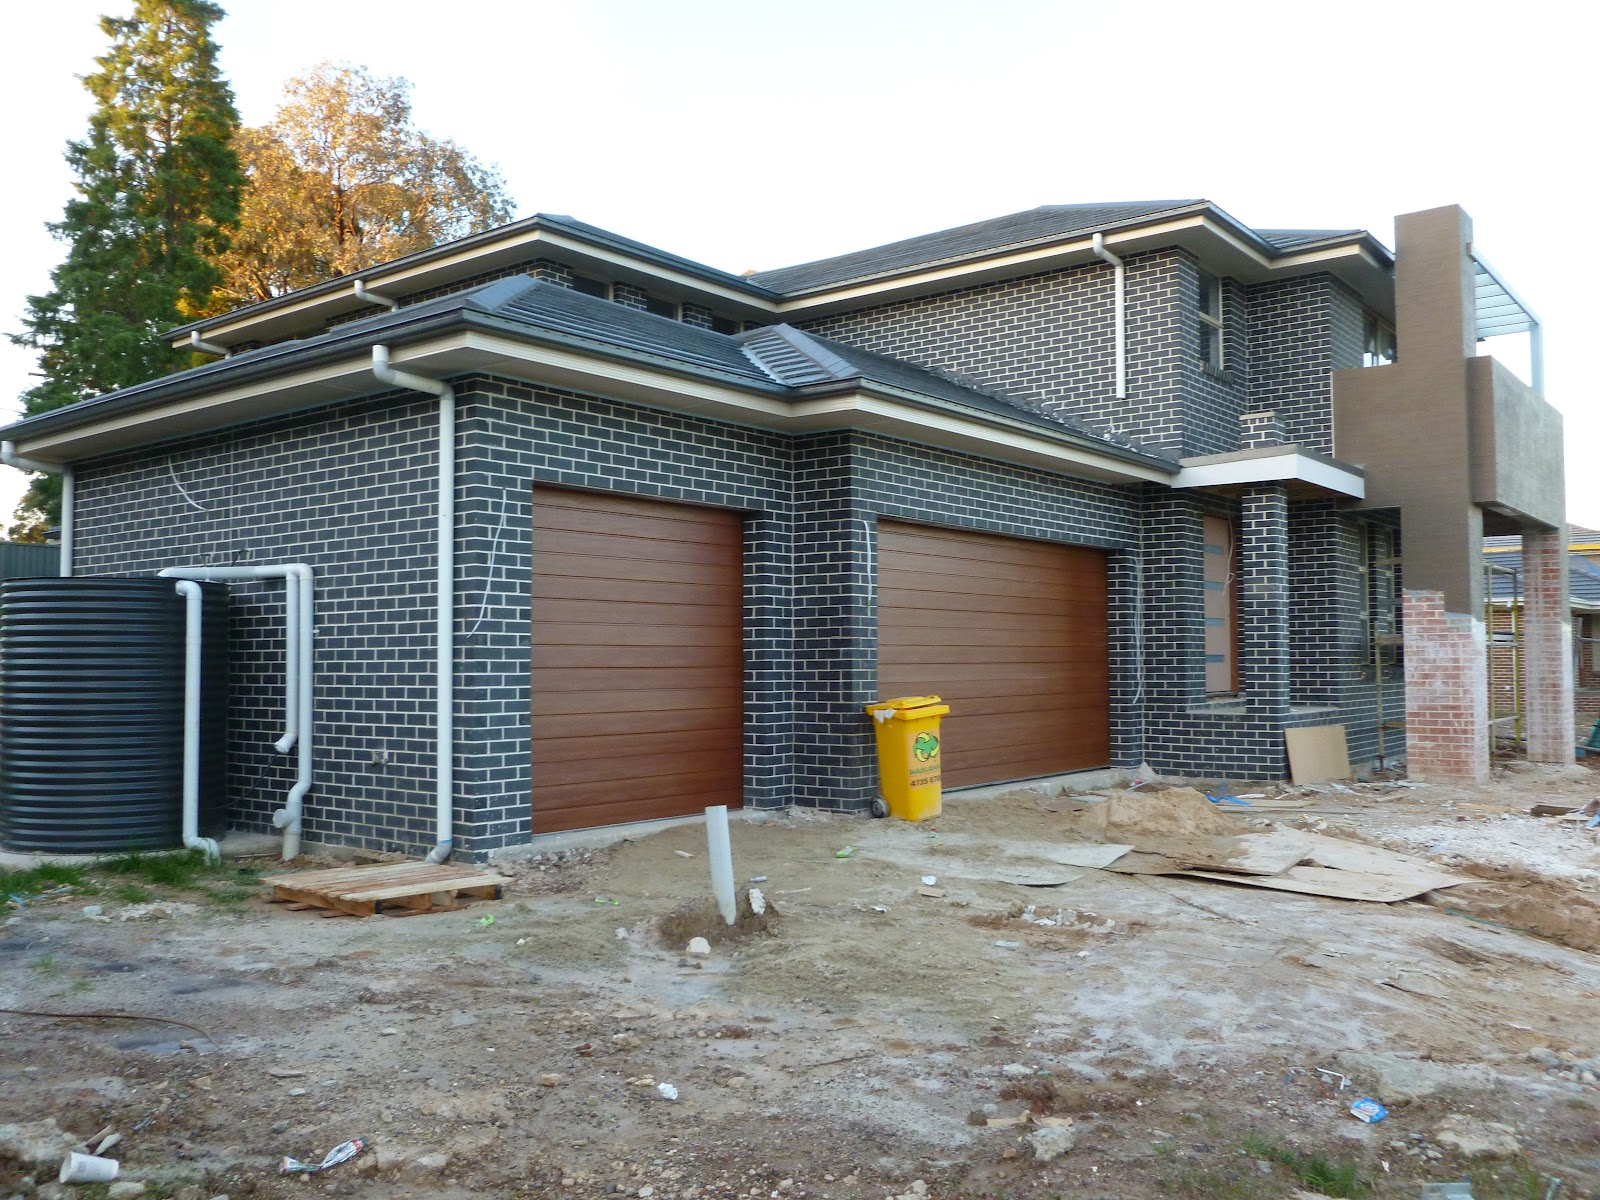 1200 #634735 Steel Garage Doors That Look Like Wood » Home Design 2017 pic Residential Garage Doors Direct 38211600